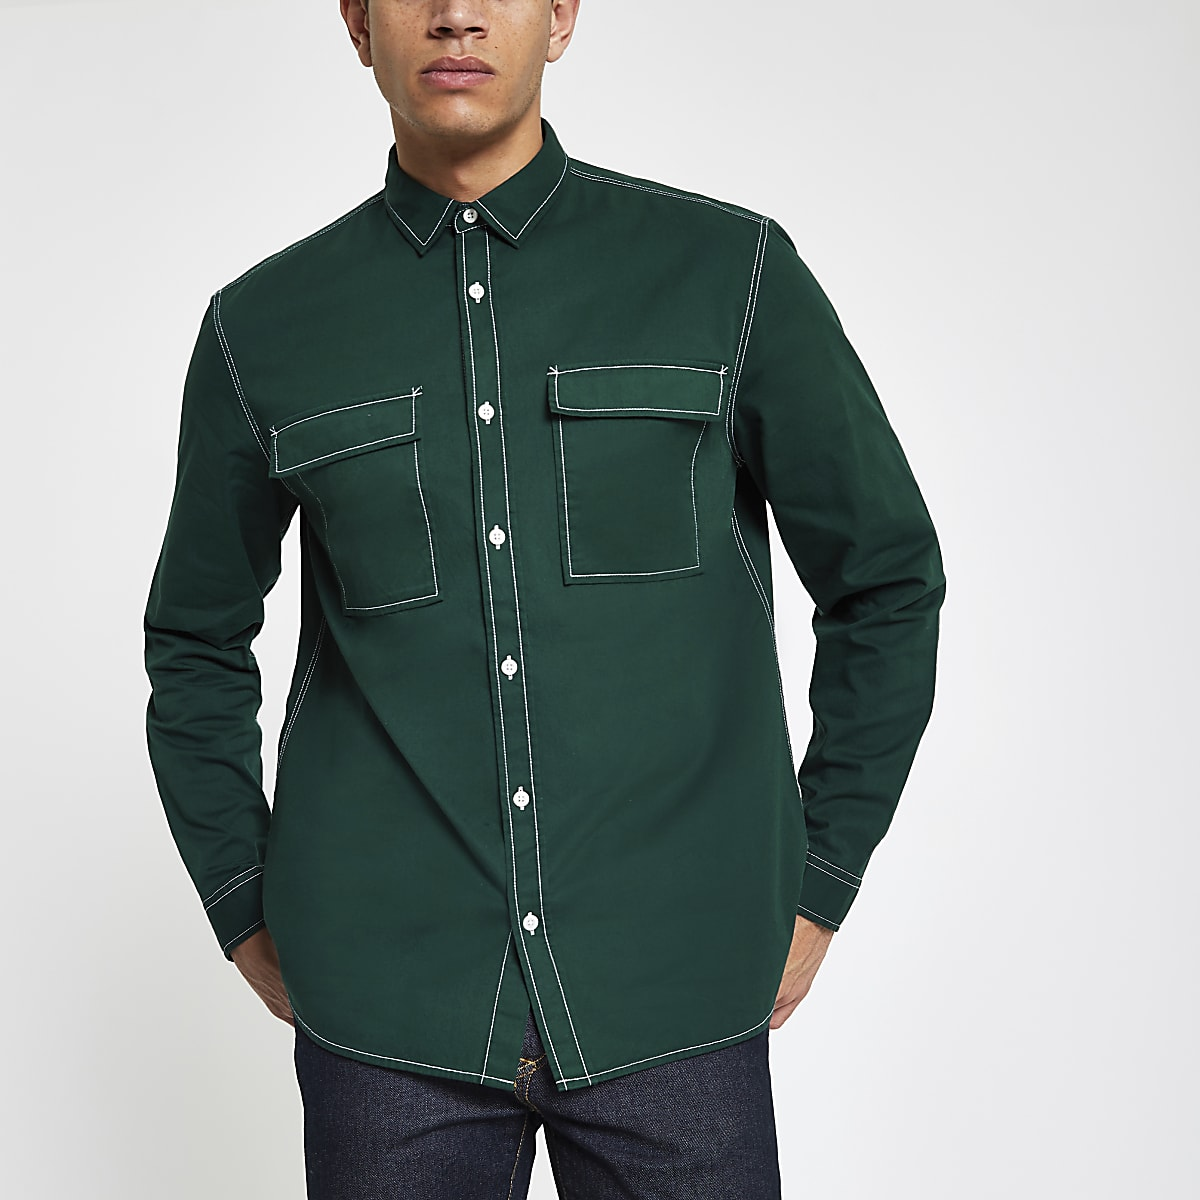 Donkergroen Overhemd.Donkergroen Utility Overhemd Met Lange Mouwen Overhemden Met Lange